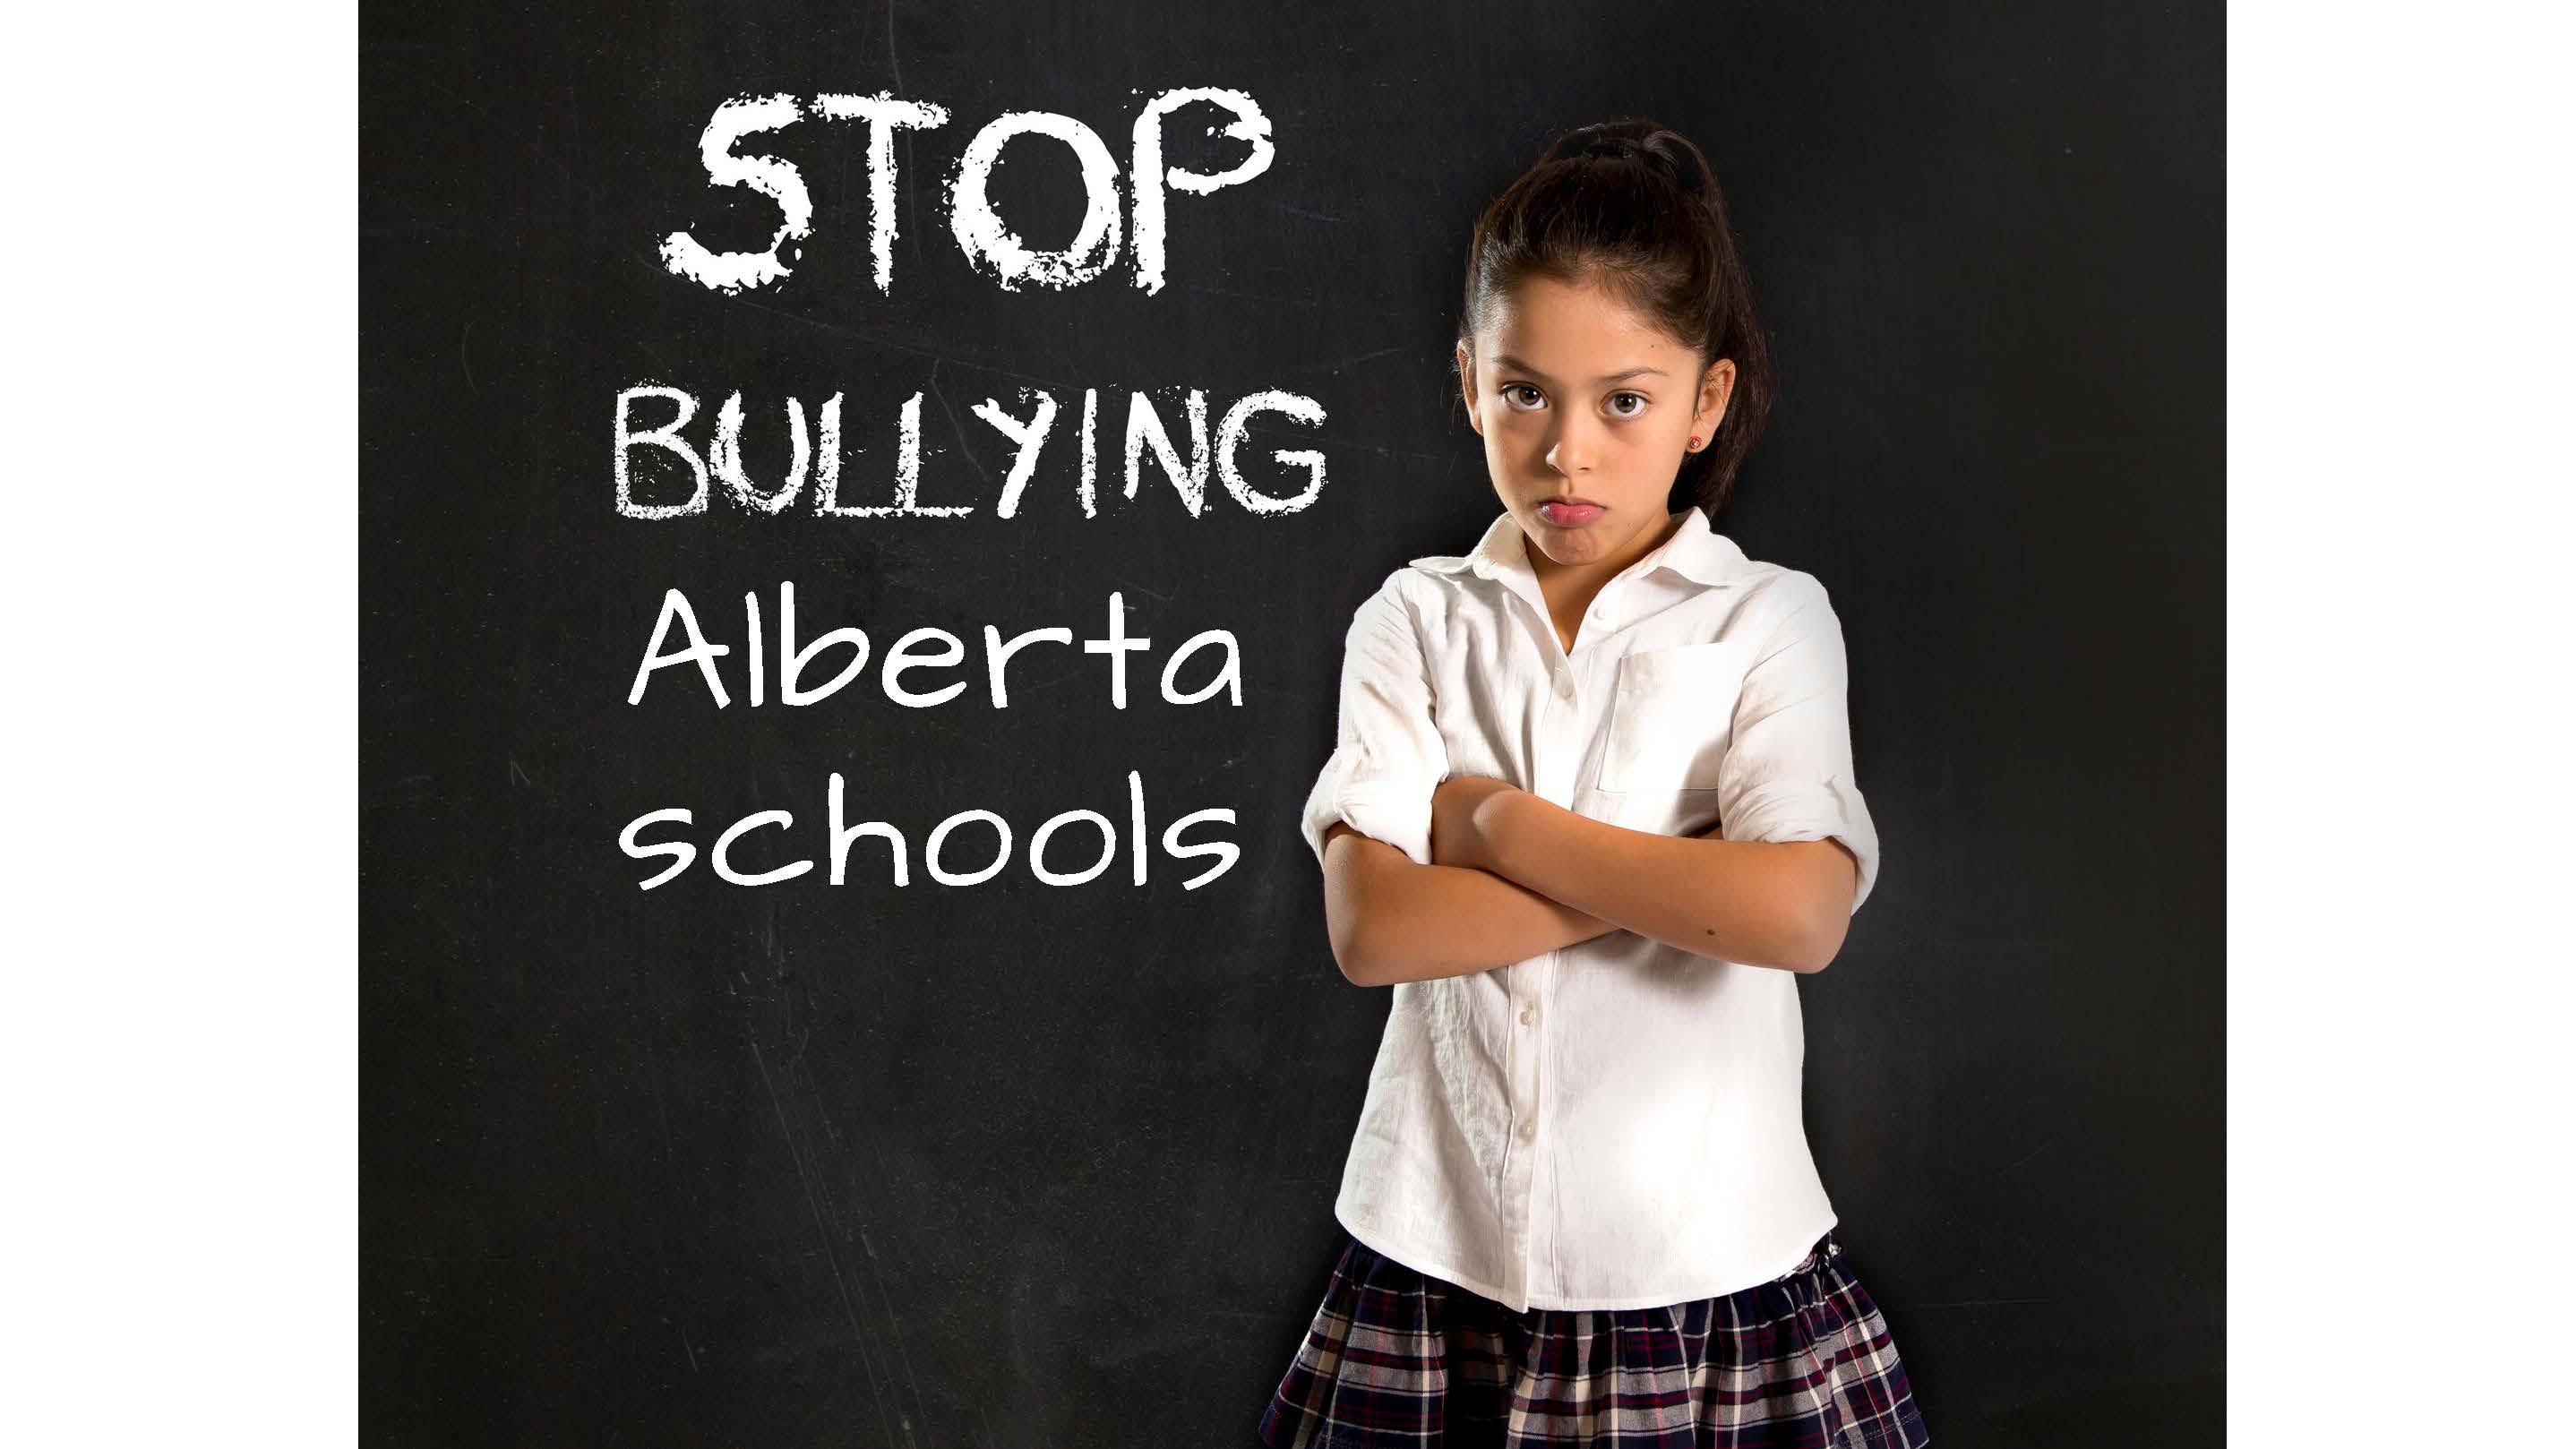 Stop_bullying_Alberta_schools_(1).jpg